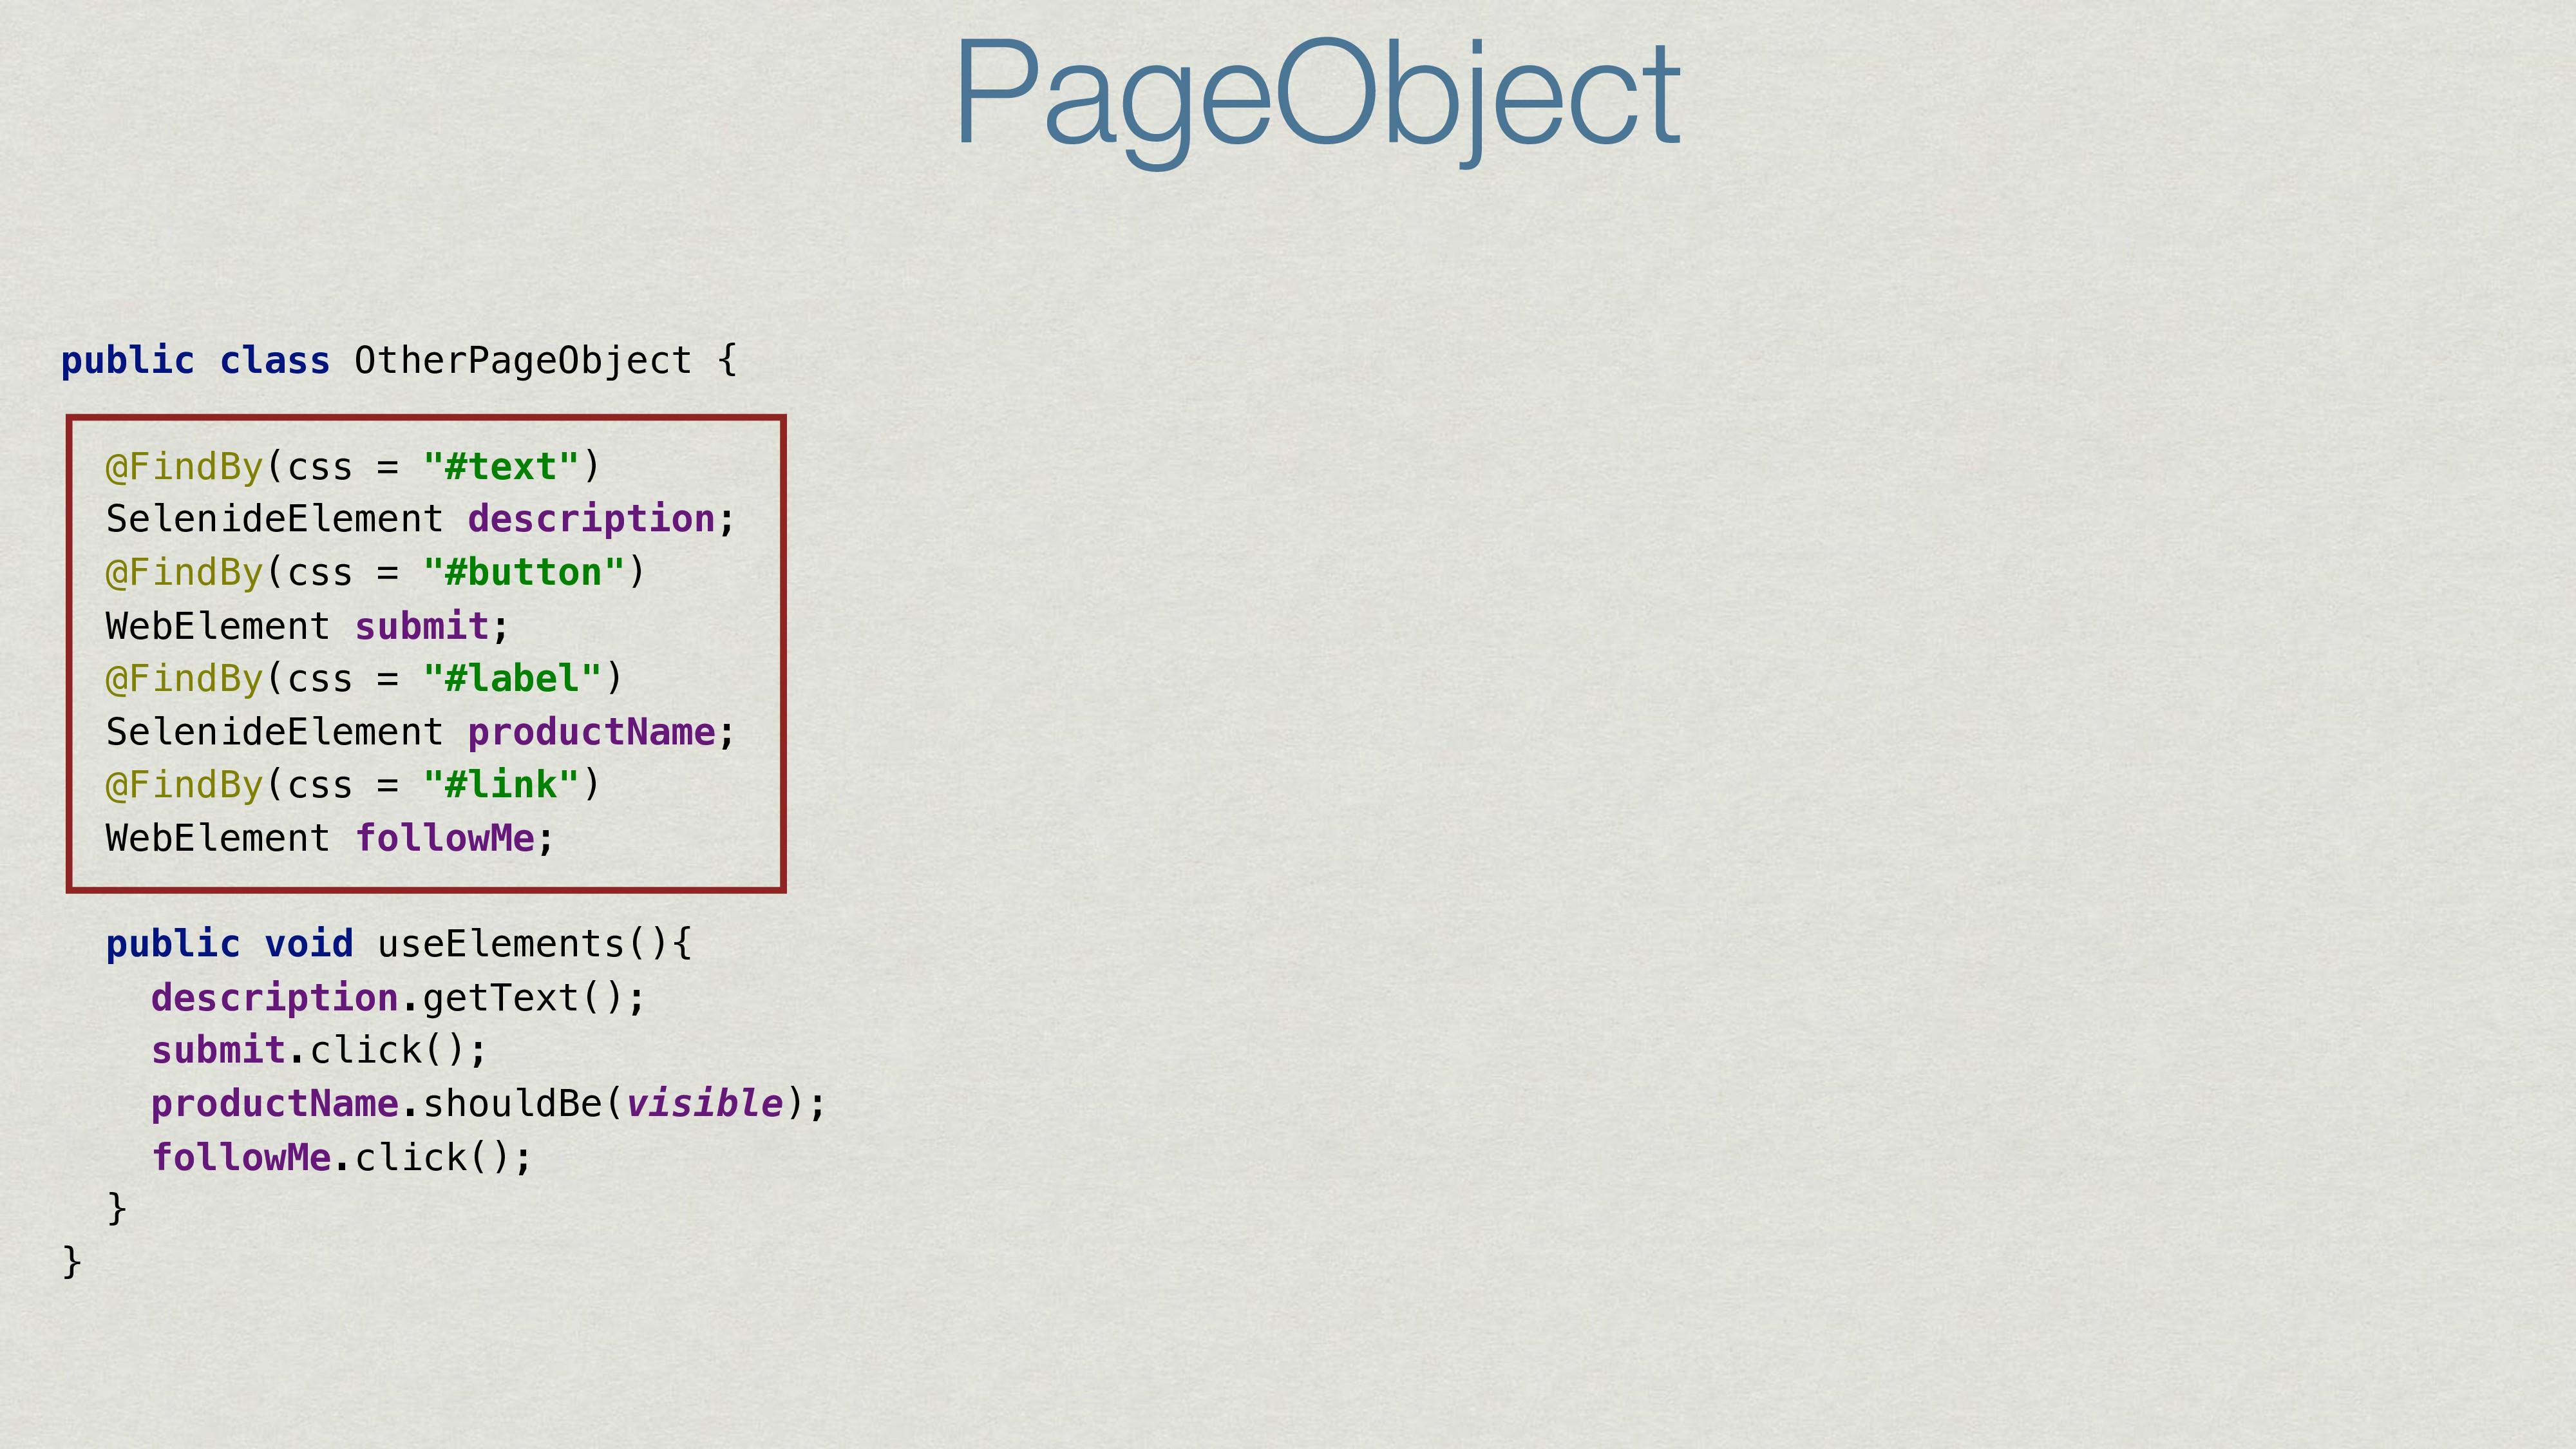 PageObject public class OtherPageObject { @Find...